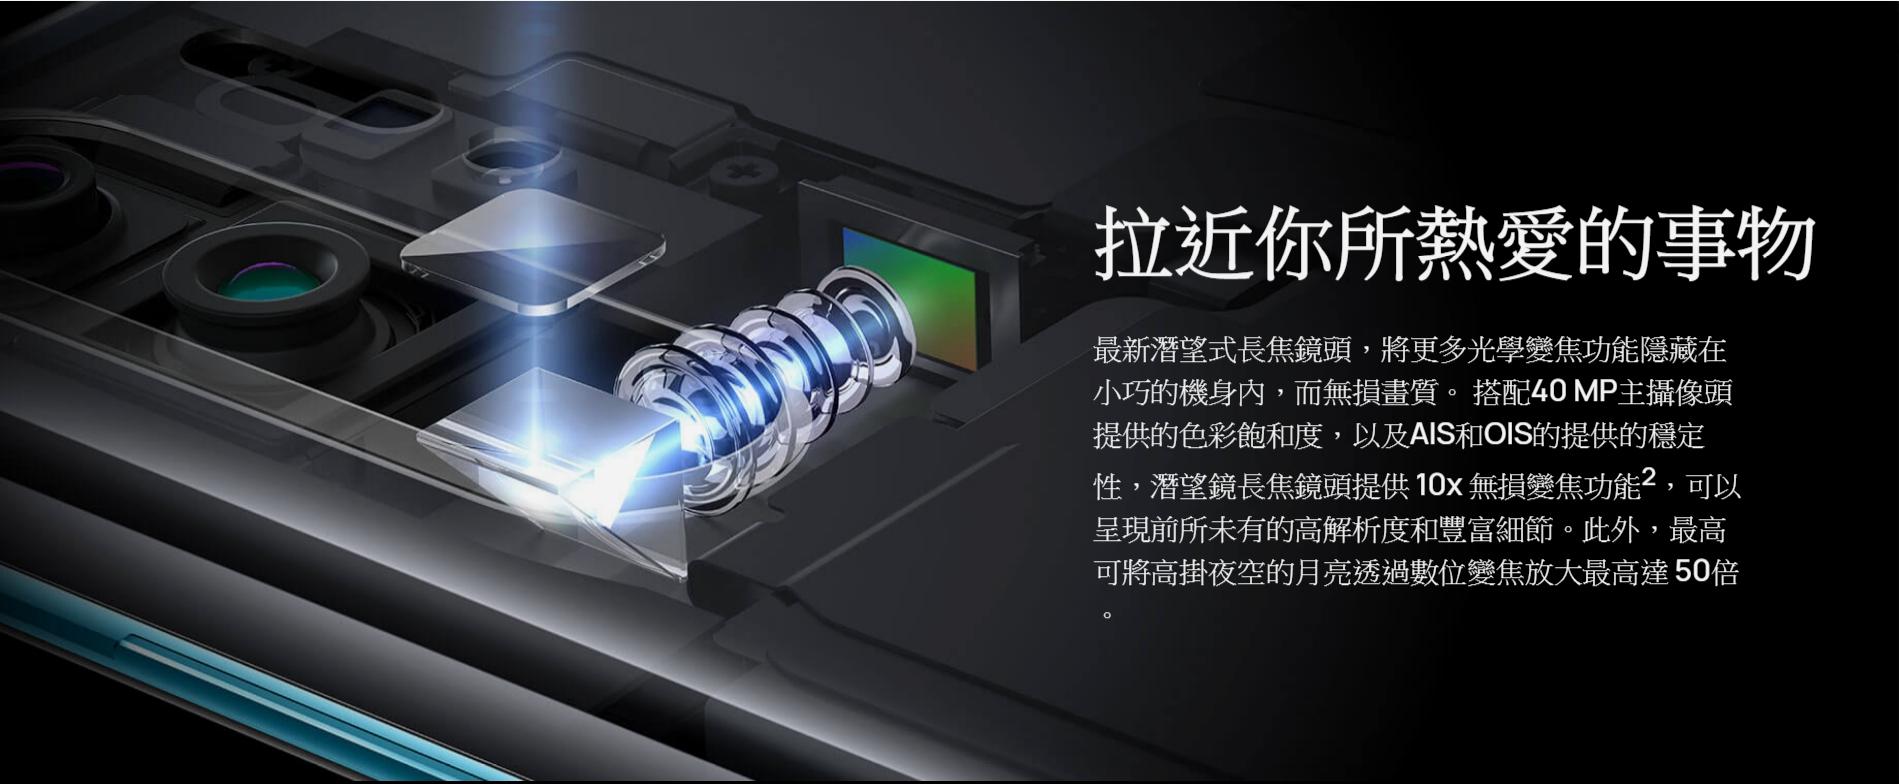 HUAWEI 10倍混合變焦 50倍數位變焦